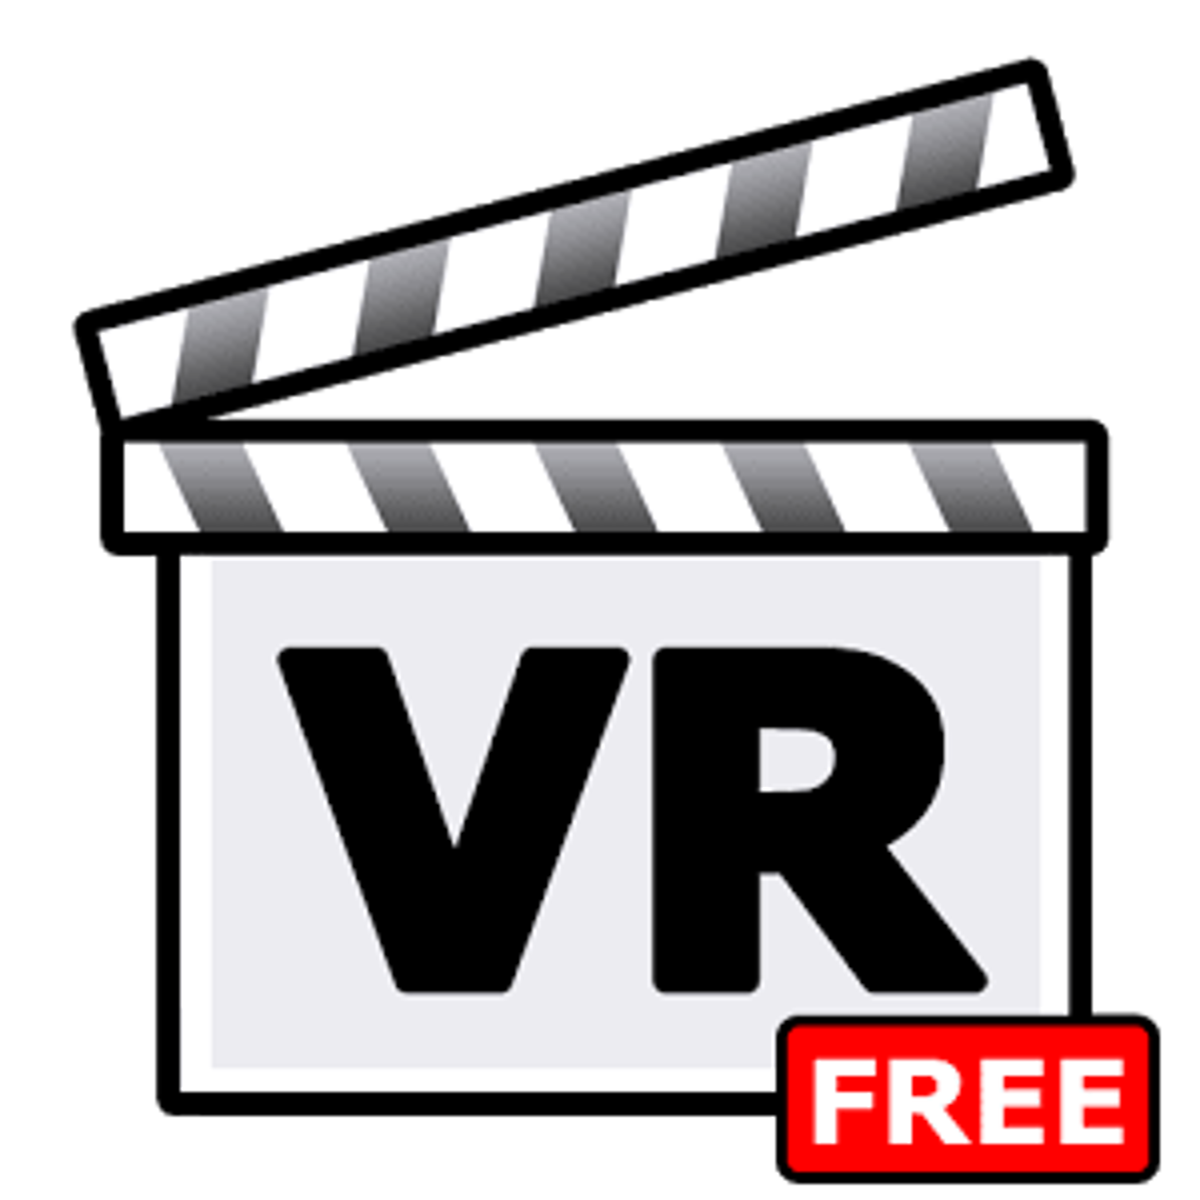 VR Player FREE 1.0.3